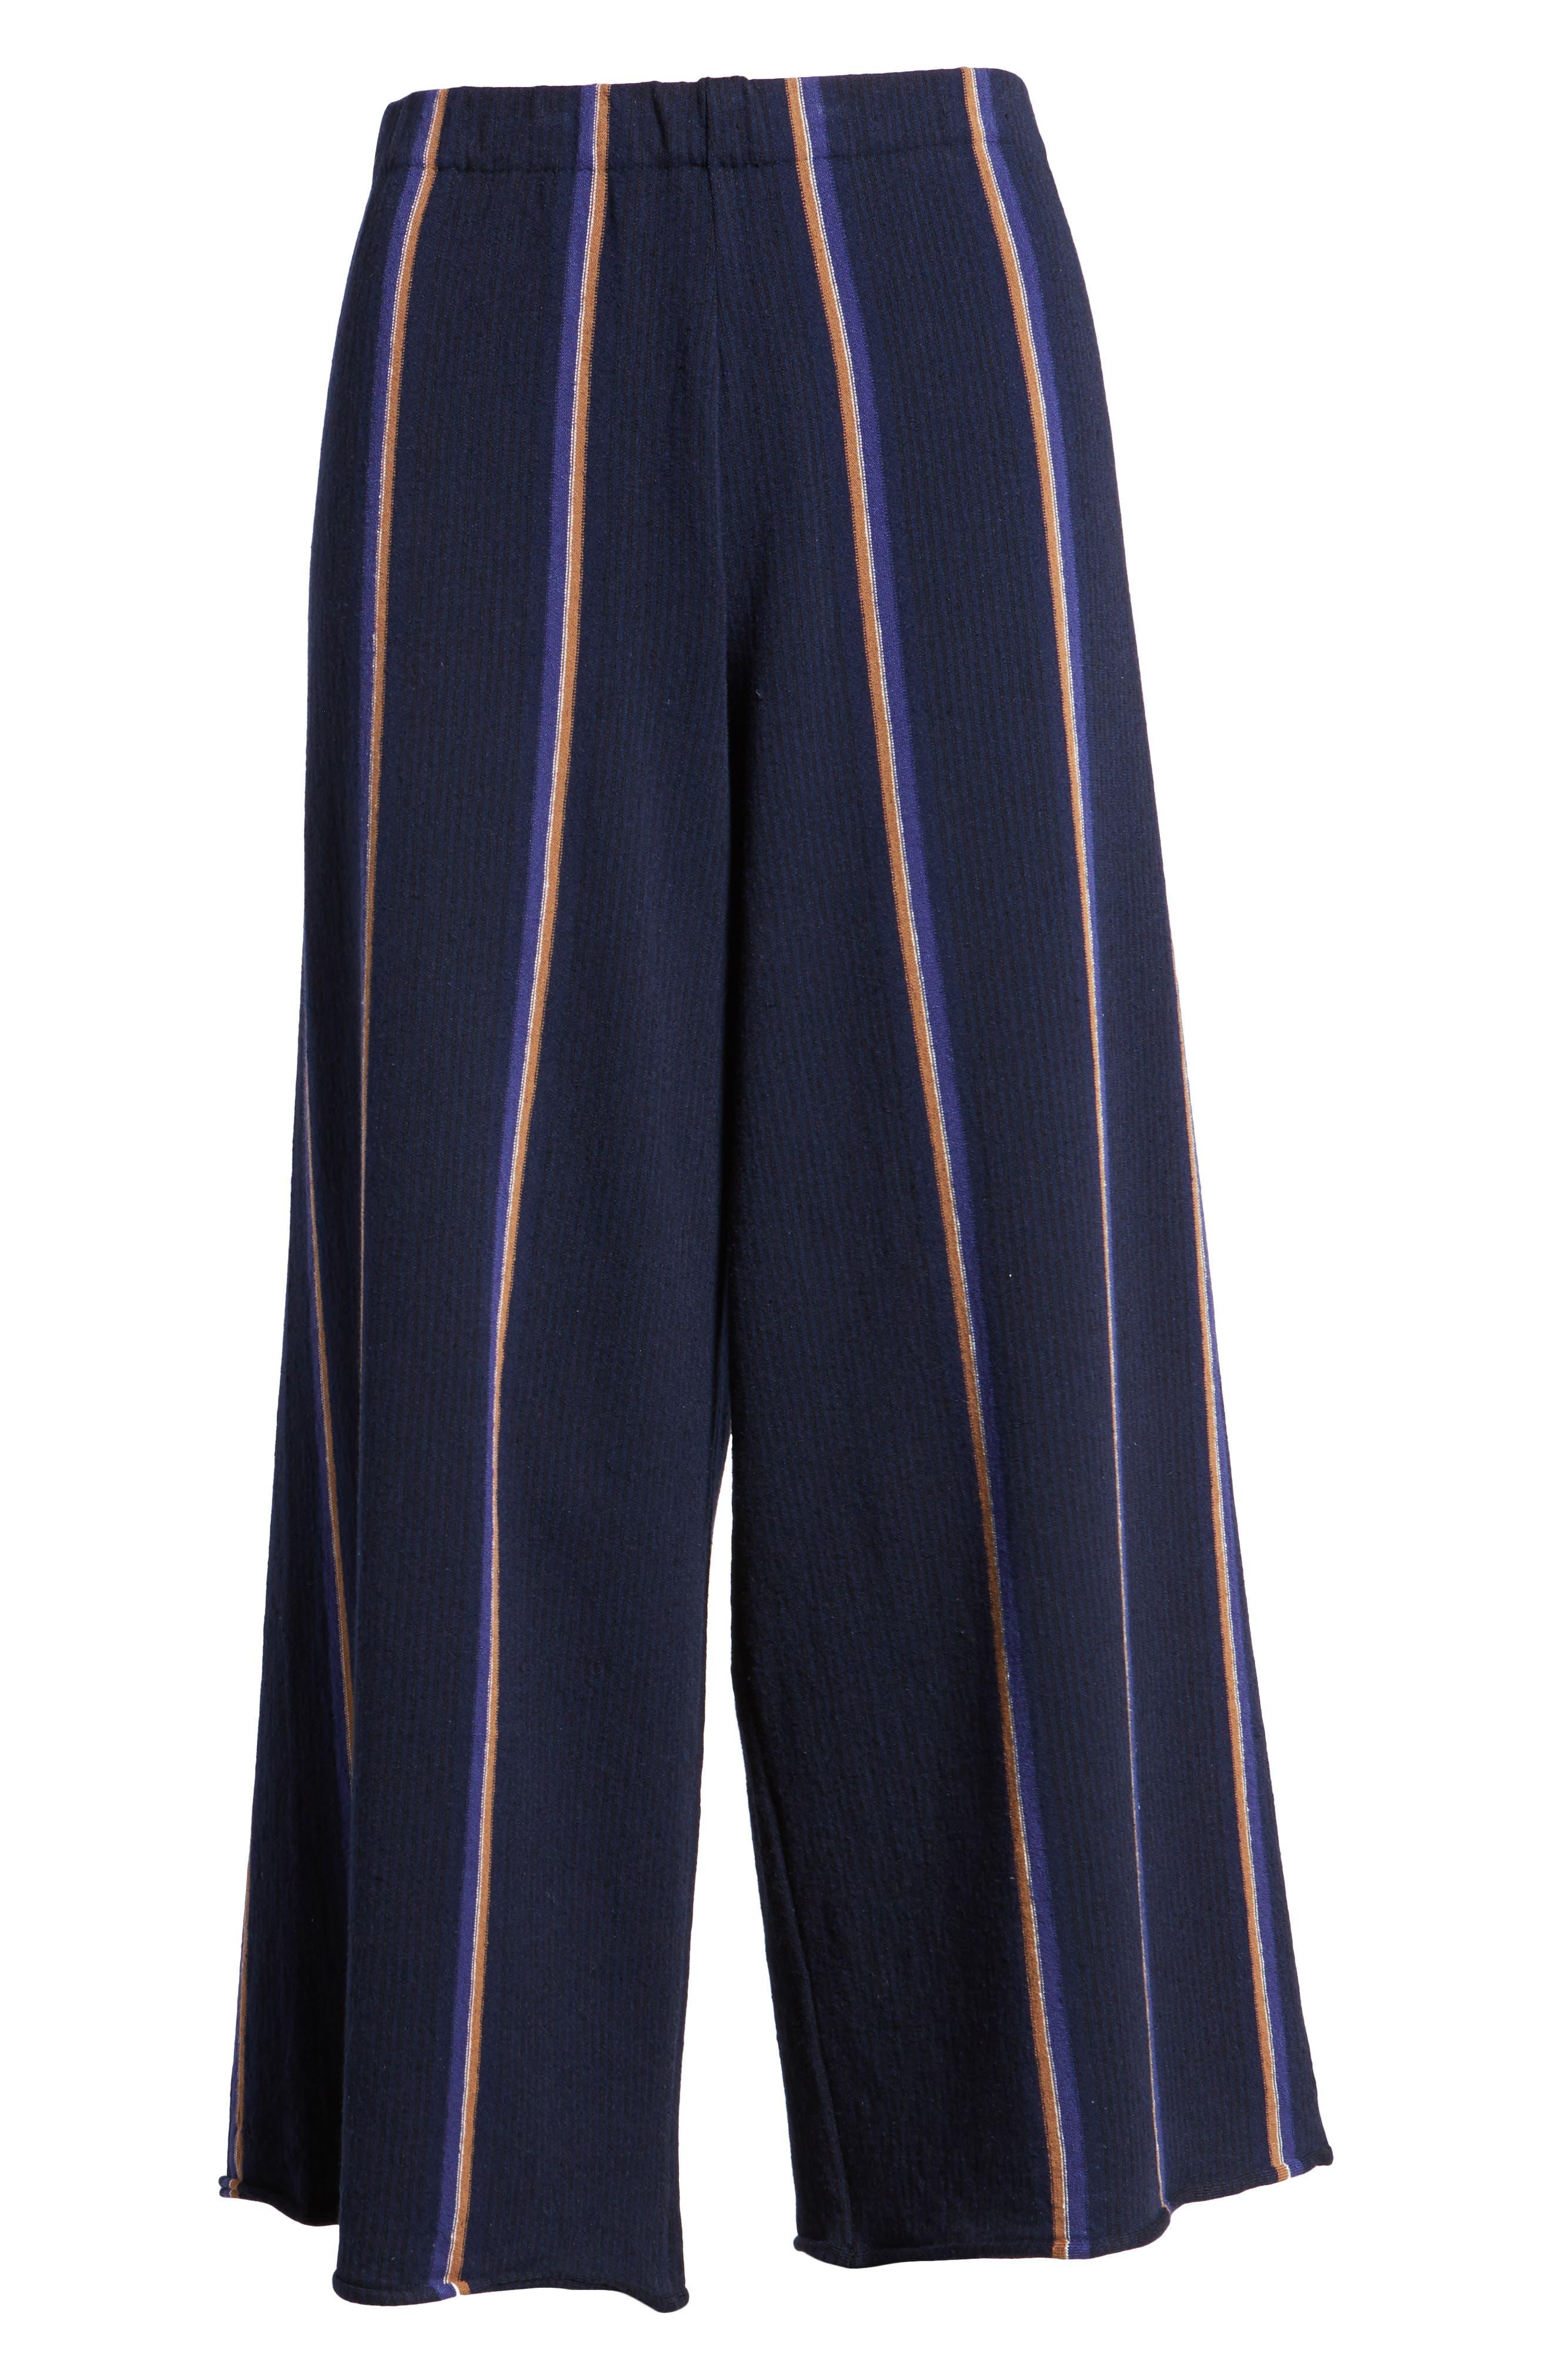 Lined Up Knit Pants,                             Alternate thumbnail 7, color,                             Blue Multi